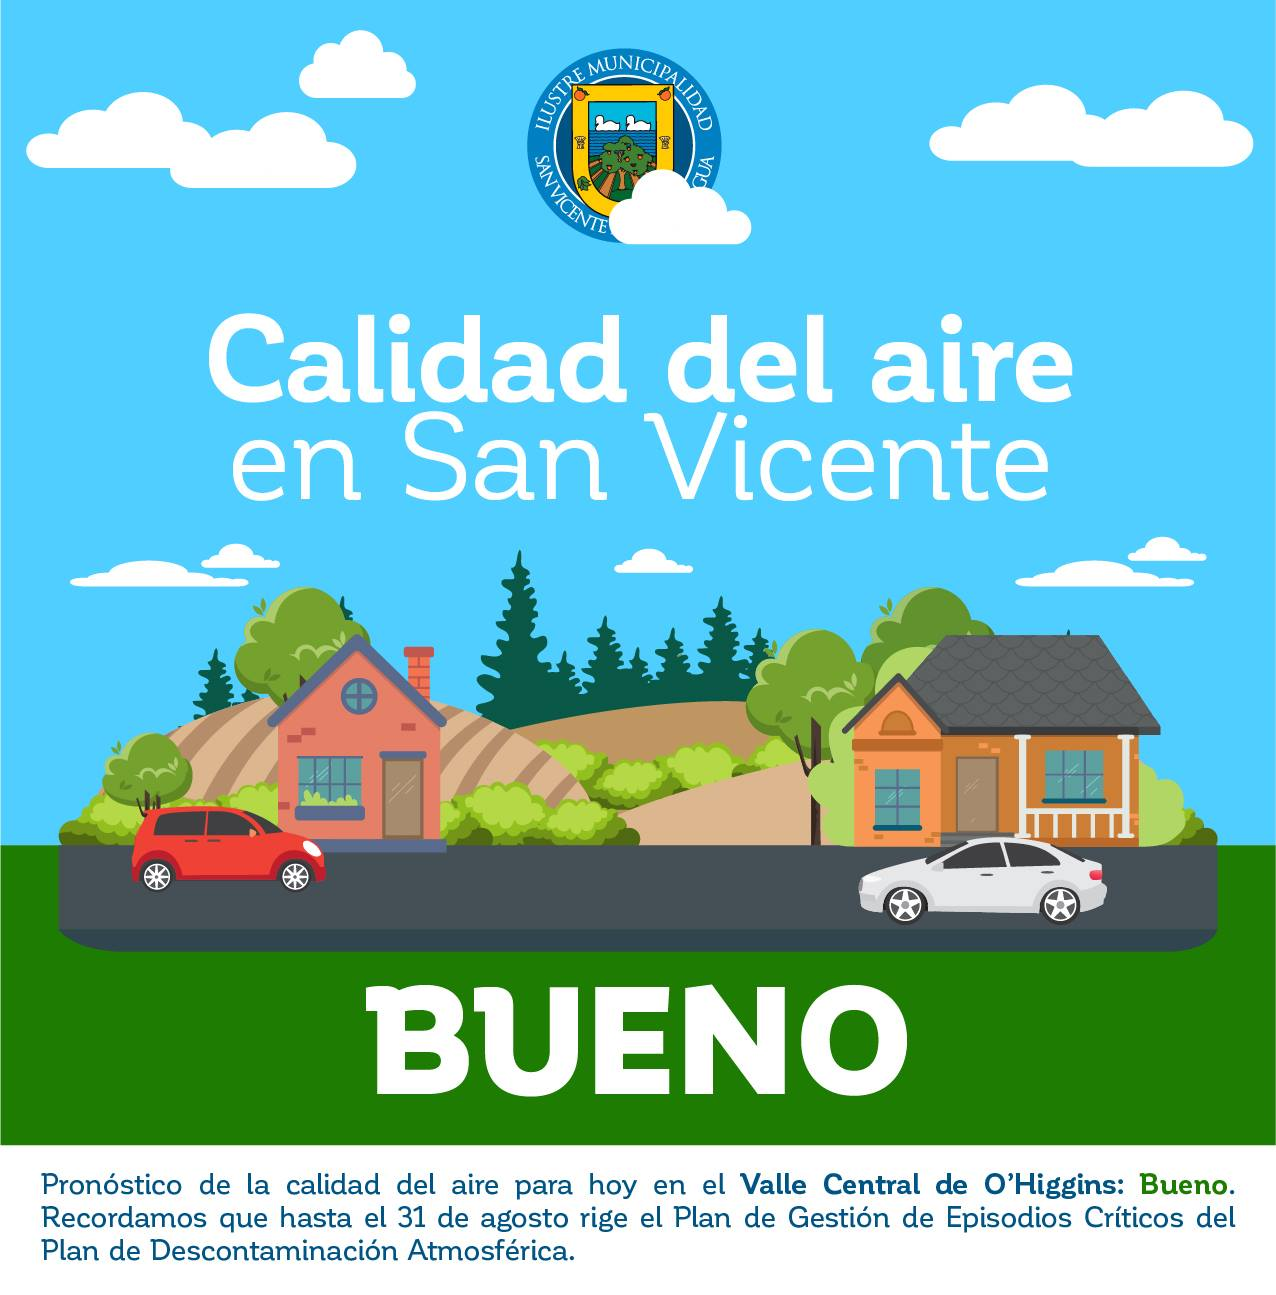 CALIDAD DEL AIRE EN SAN VICENTE DE TAGUA TAGUA: BUENO